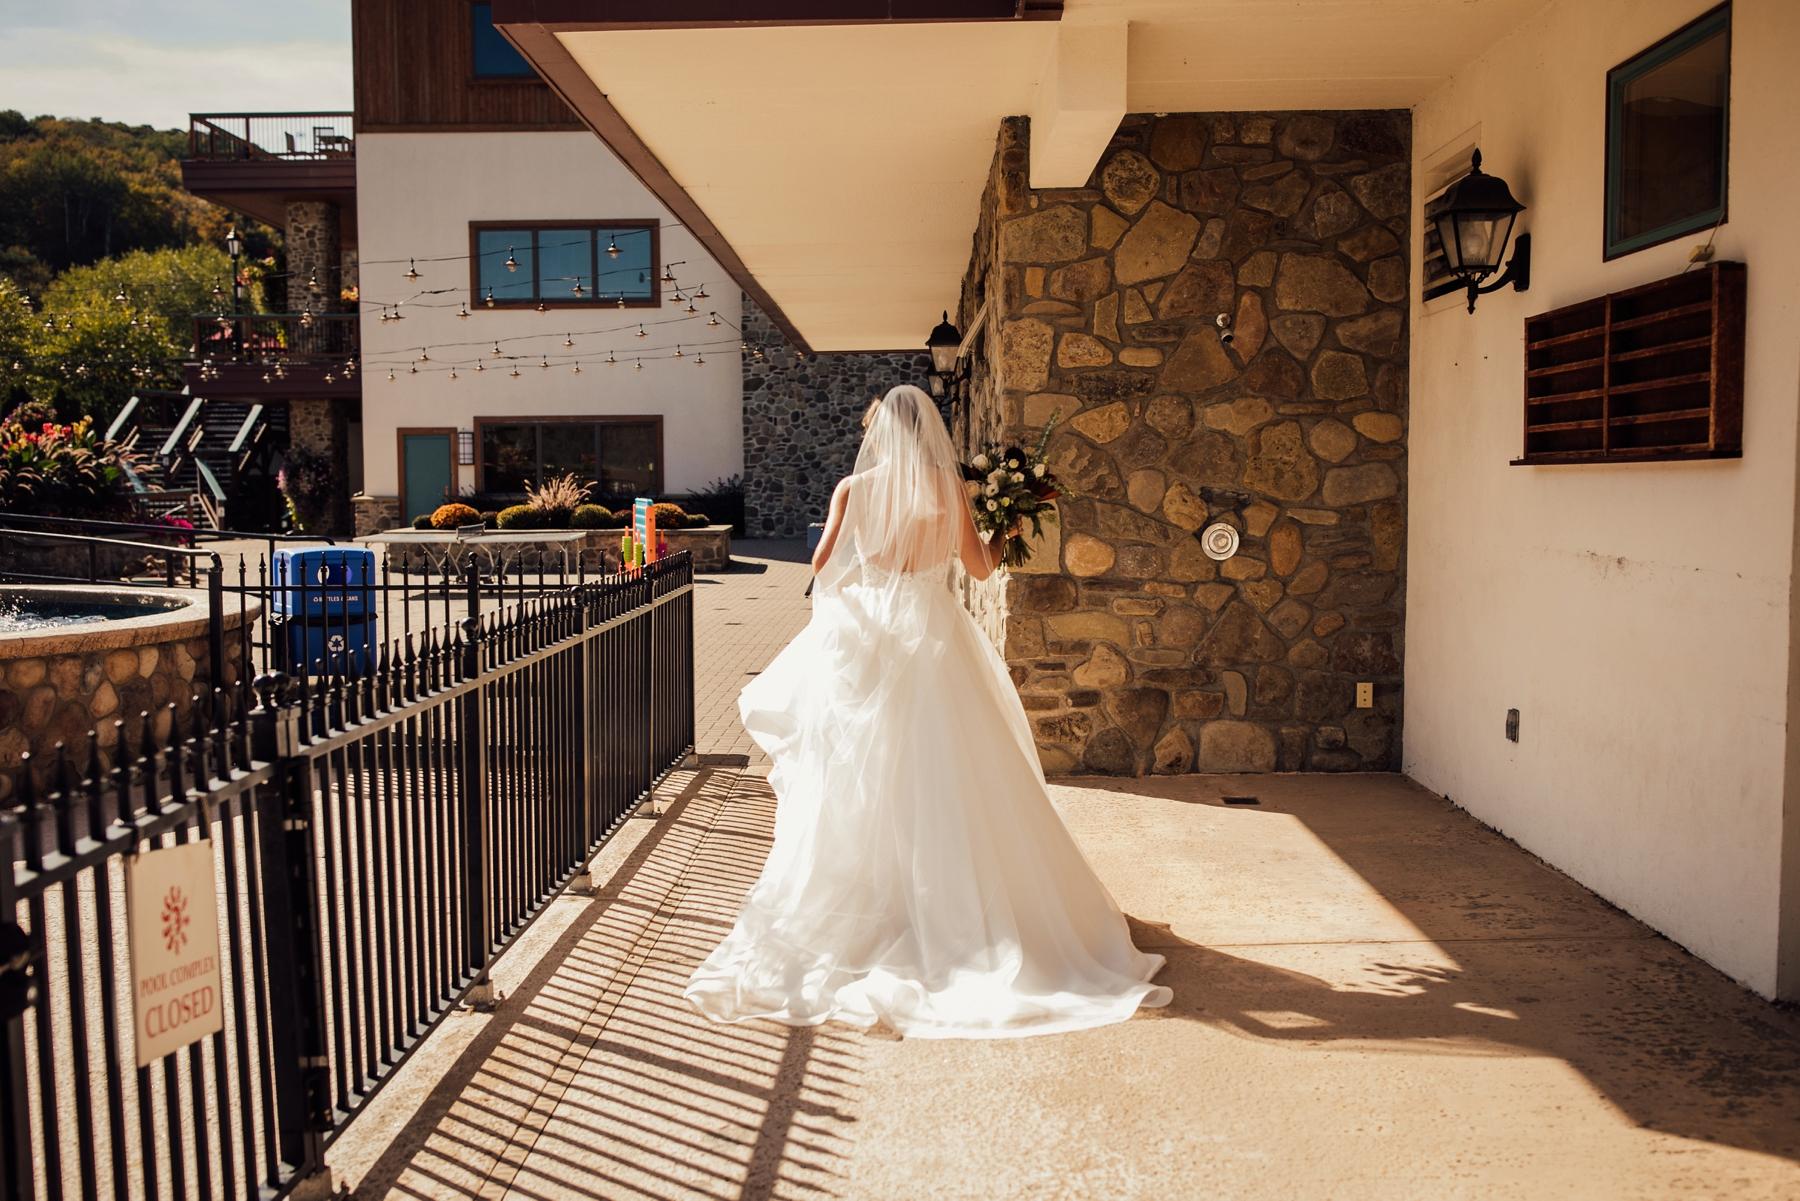 holiday valley ellicottville new york destination wedding photographer lgbtq